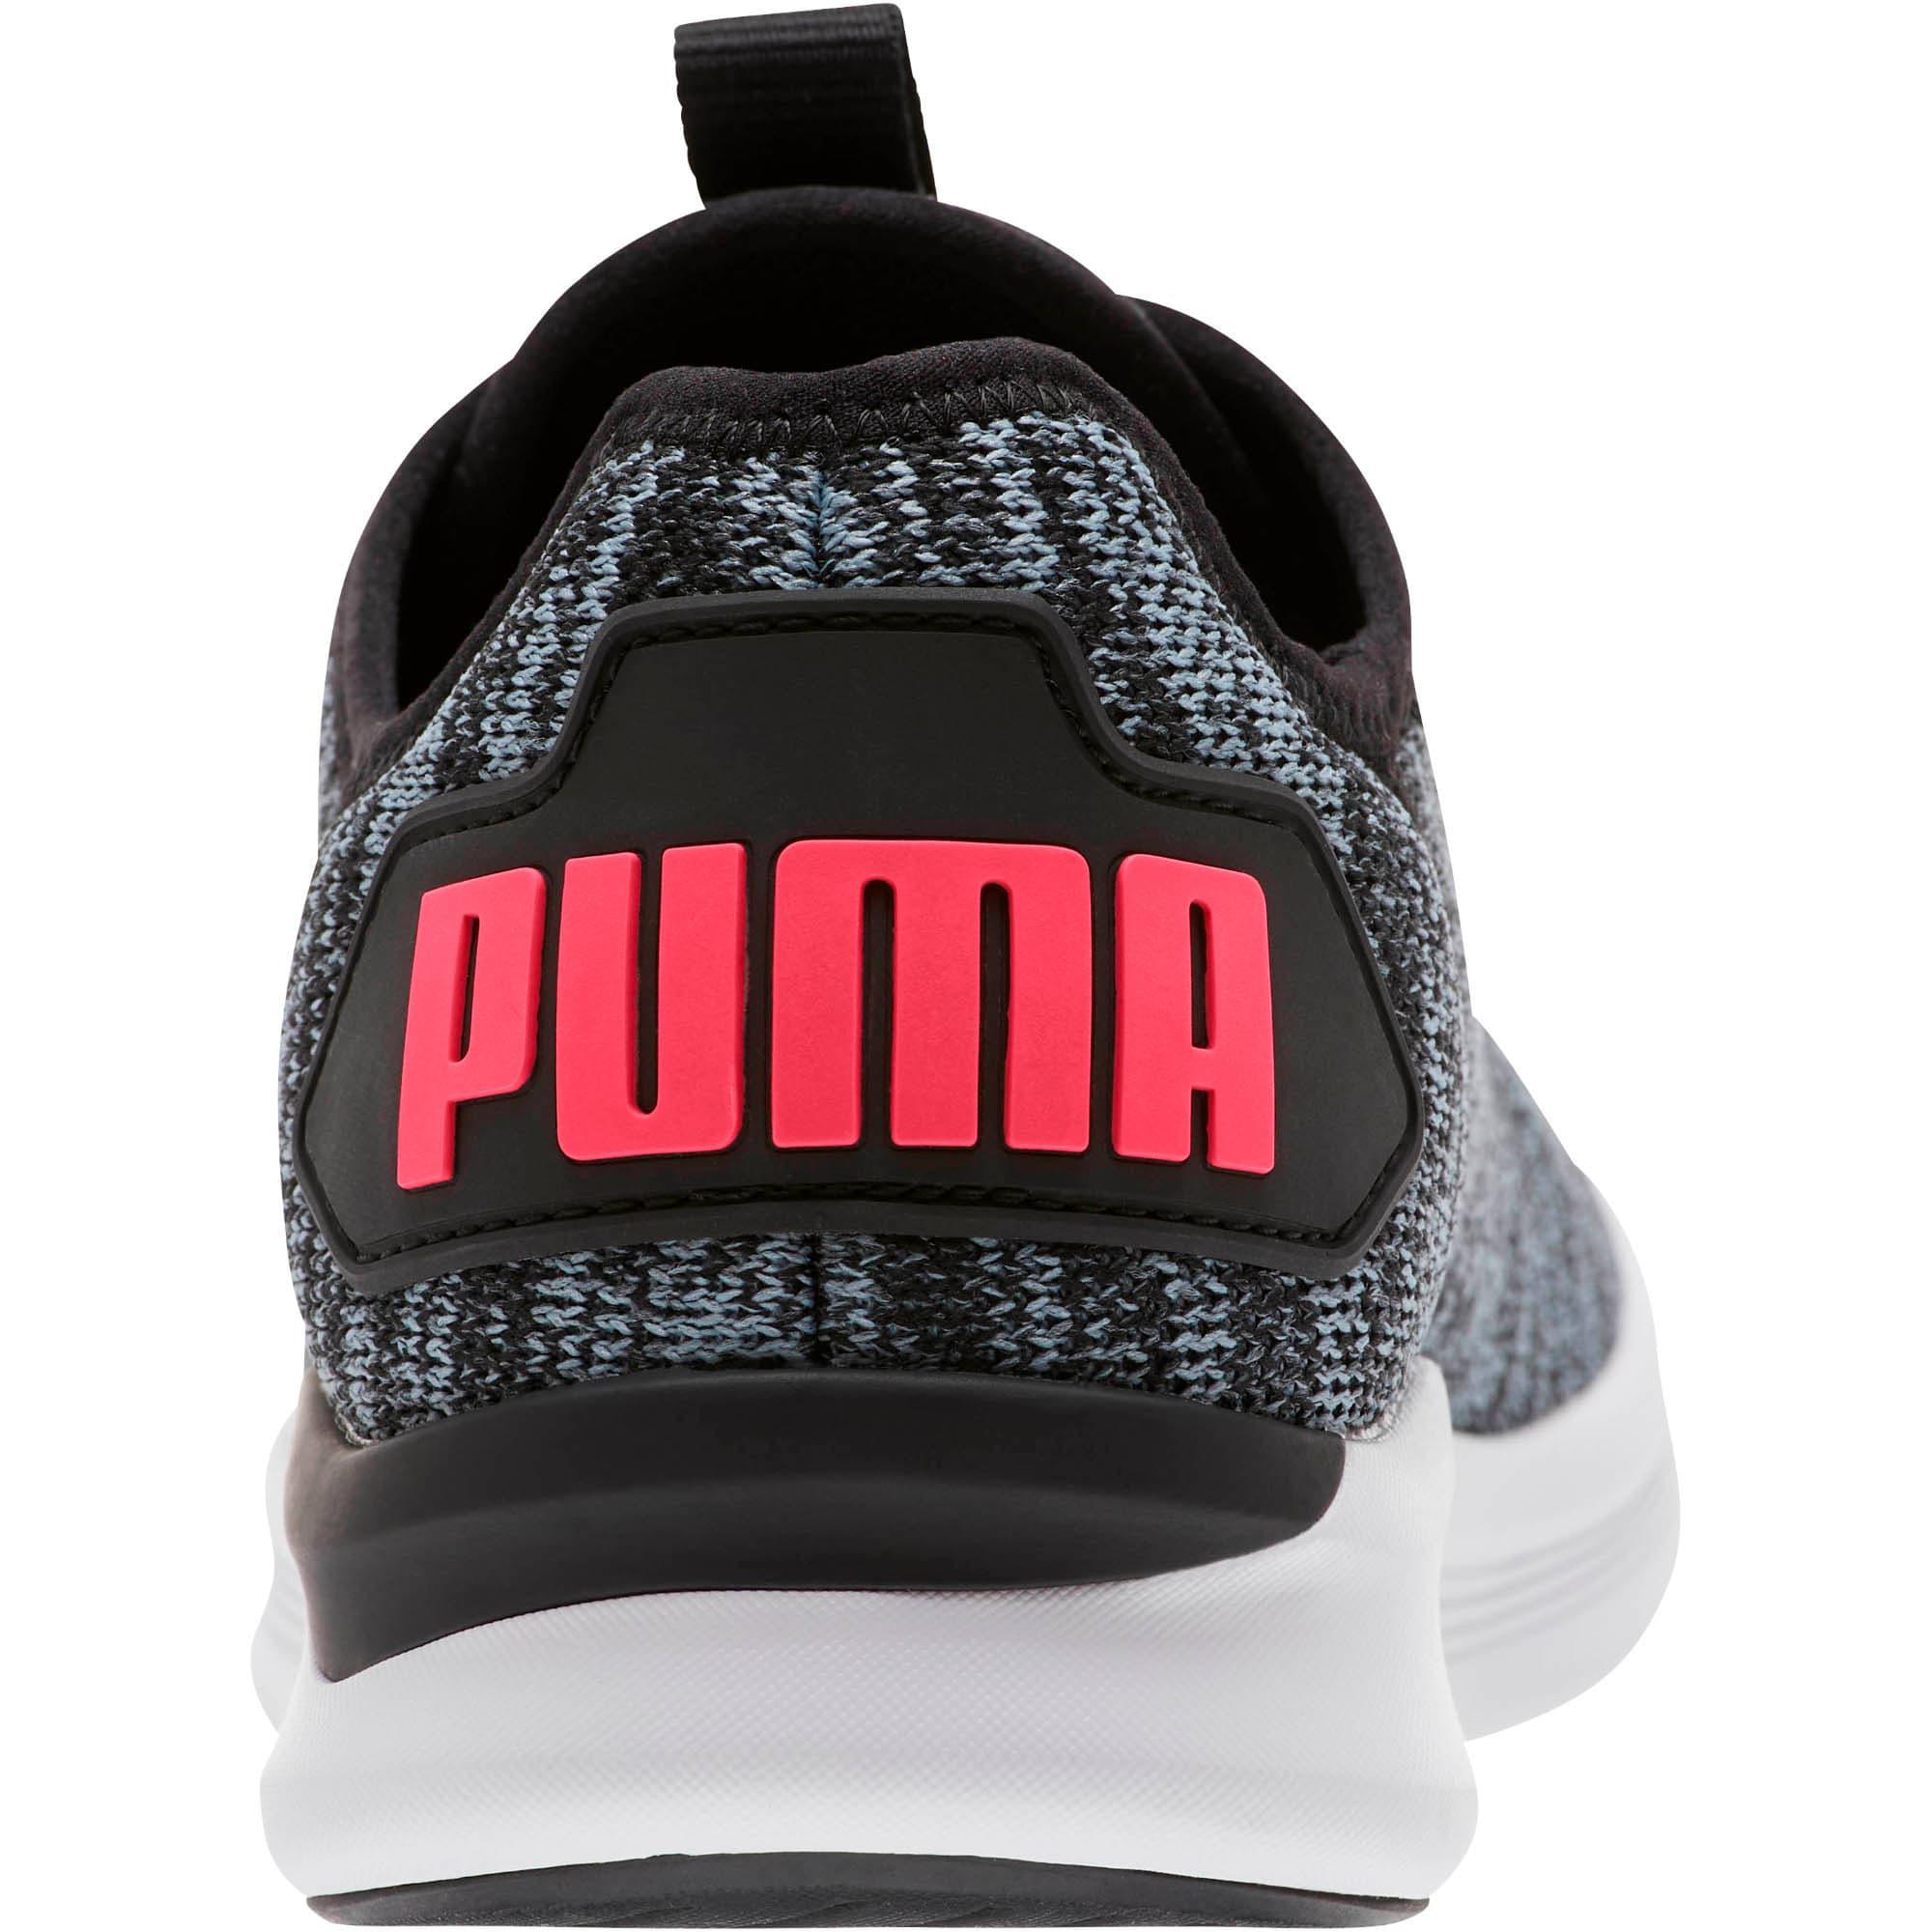 Thumbnail 3 of Ballast Women's Running Shoes, Puma Black-Pink Alert, medium